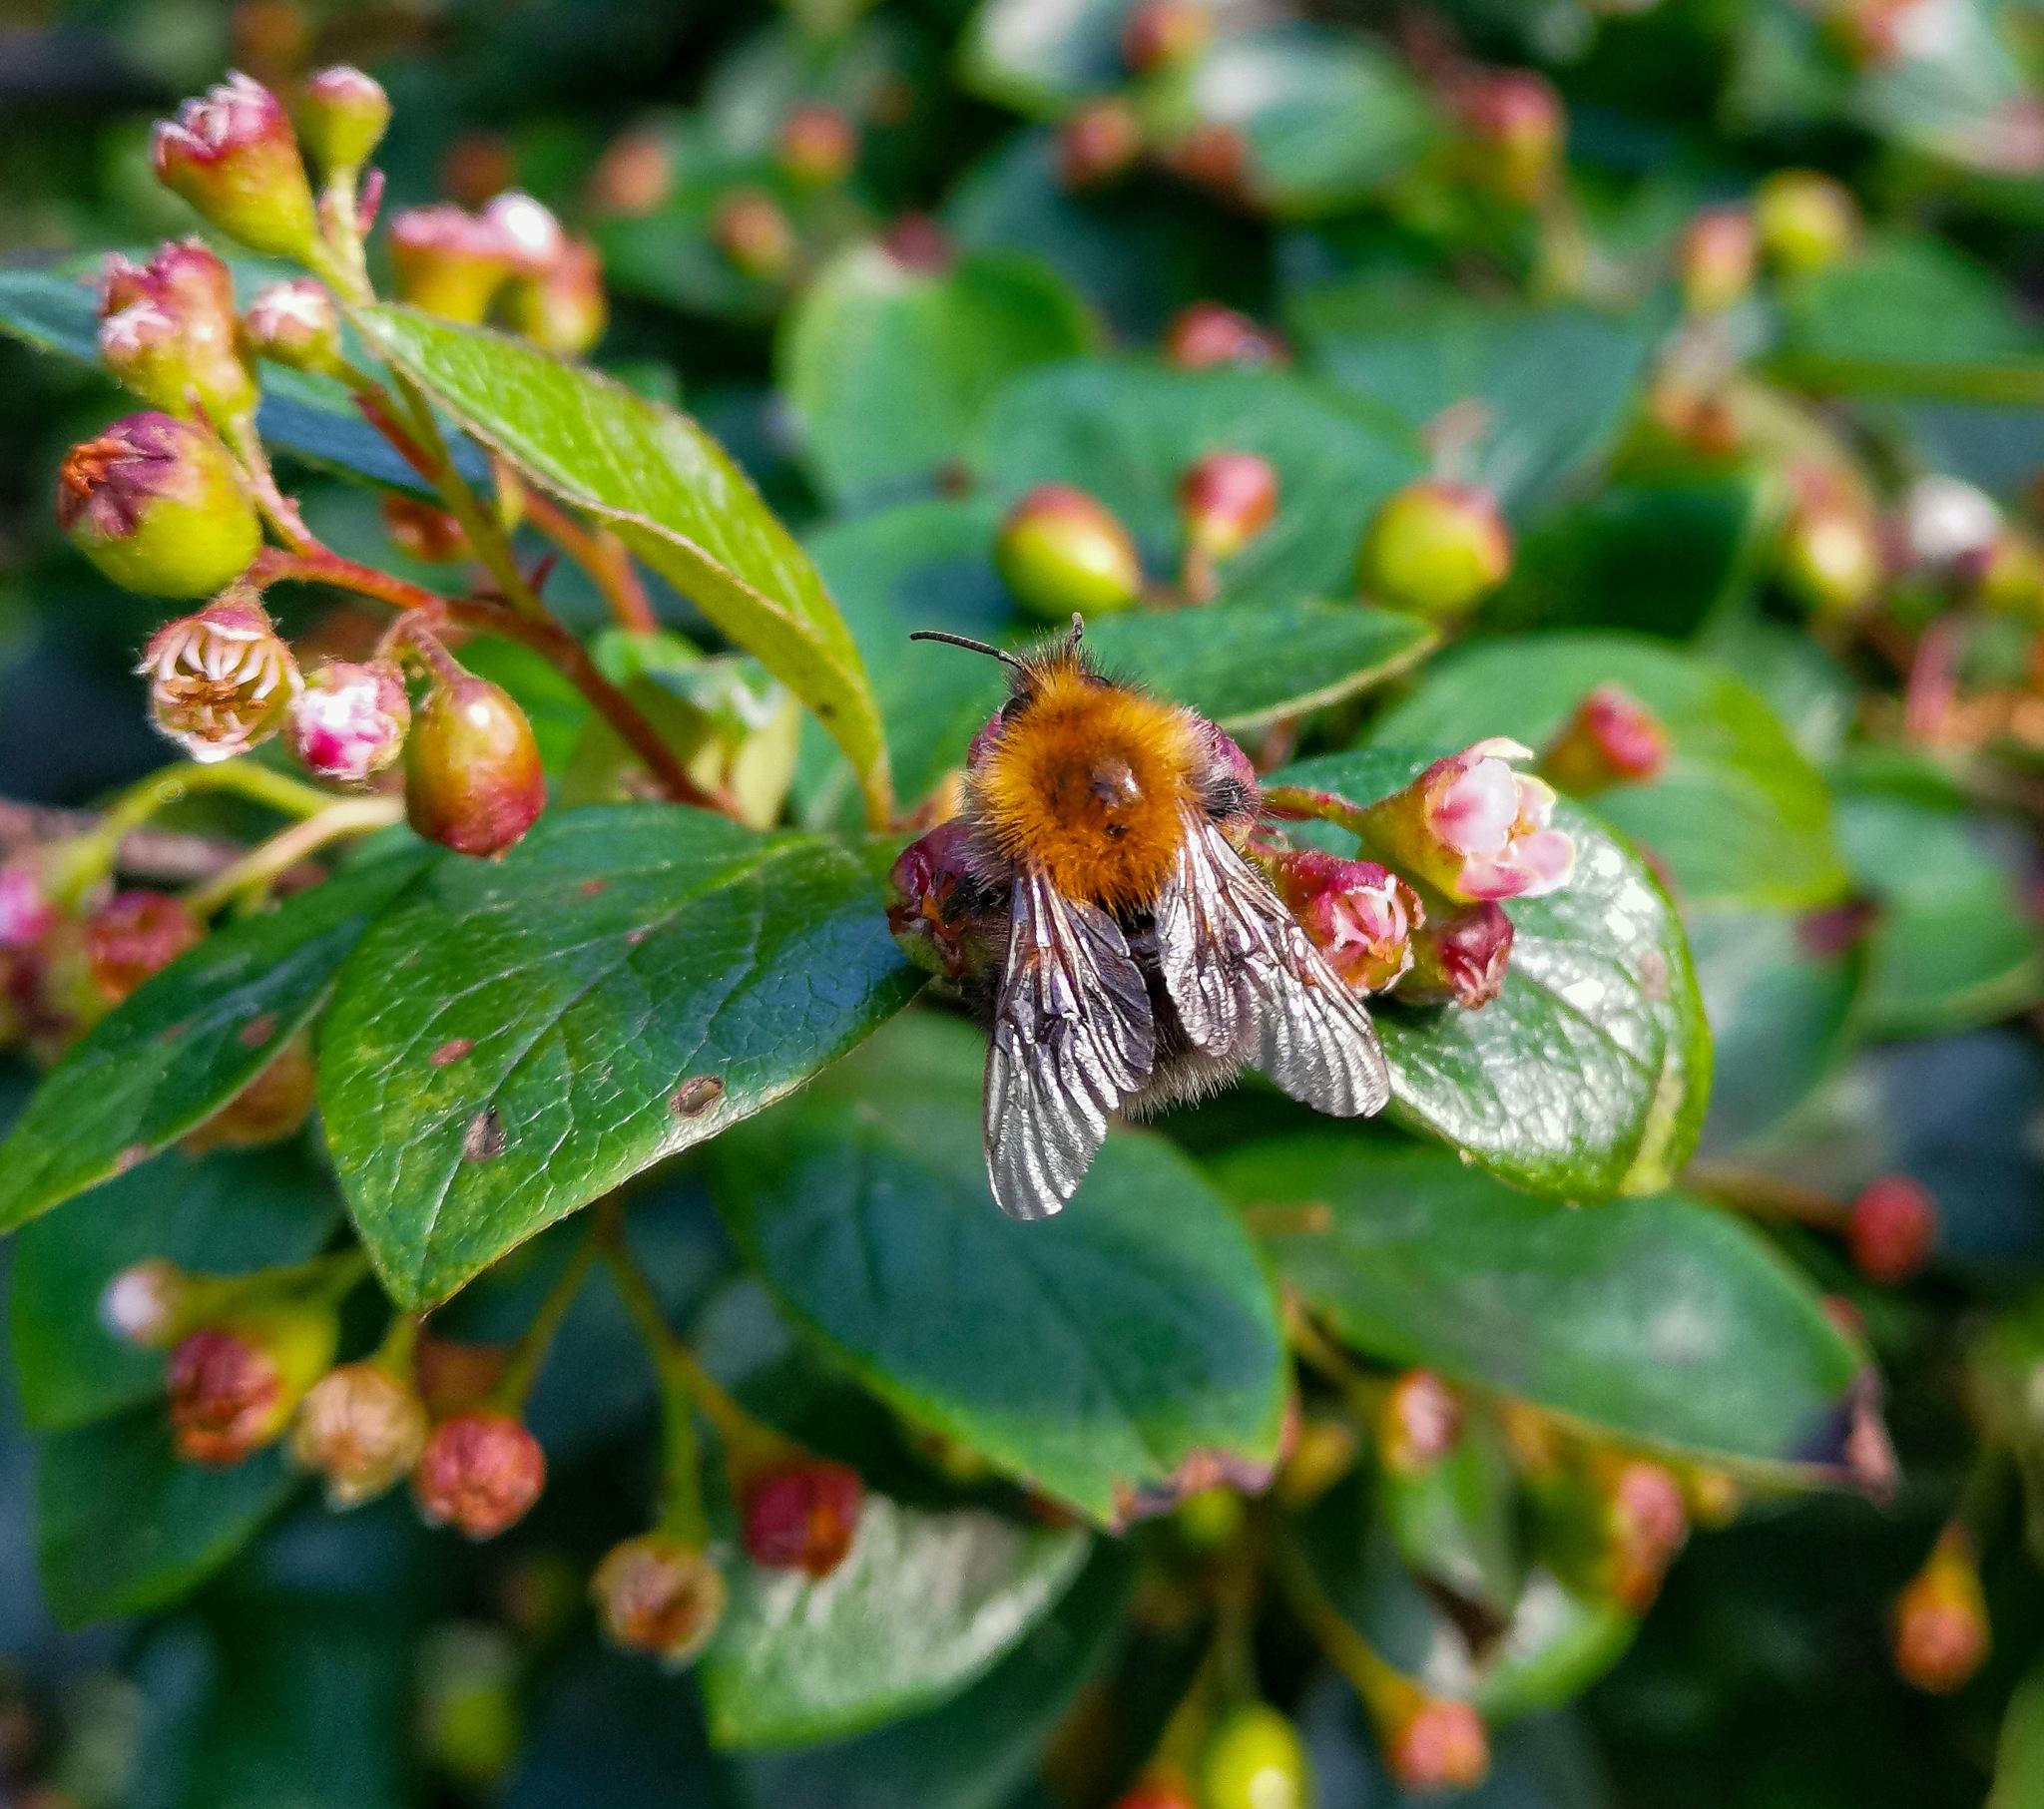 Plant fly by JonArneFoss